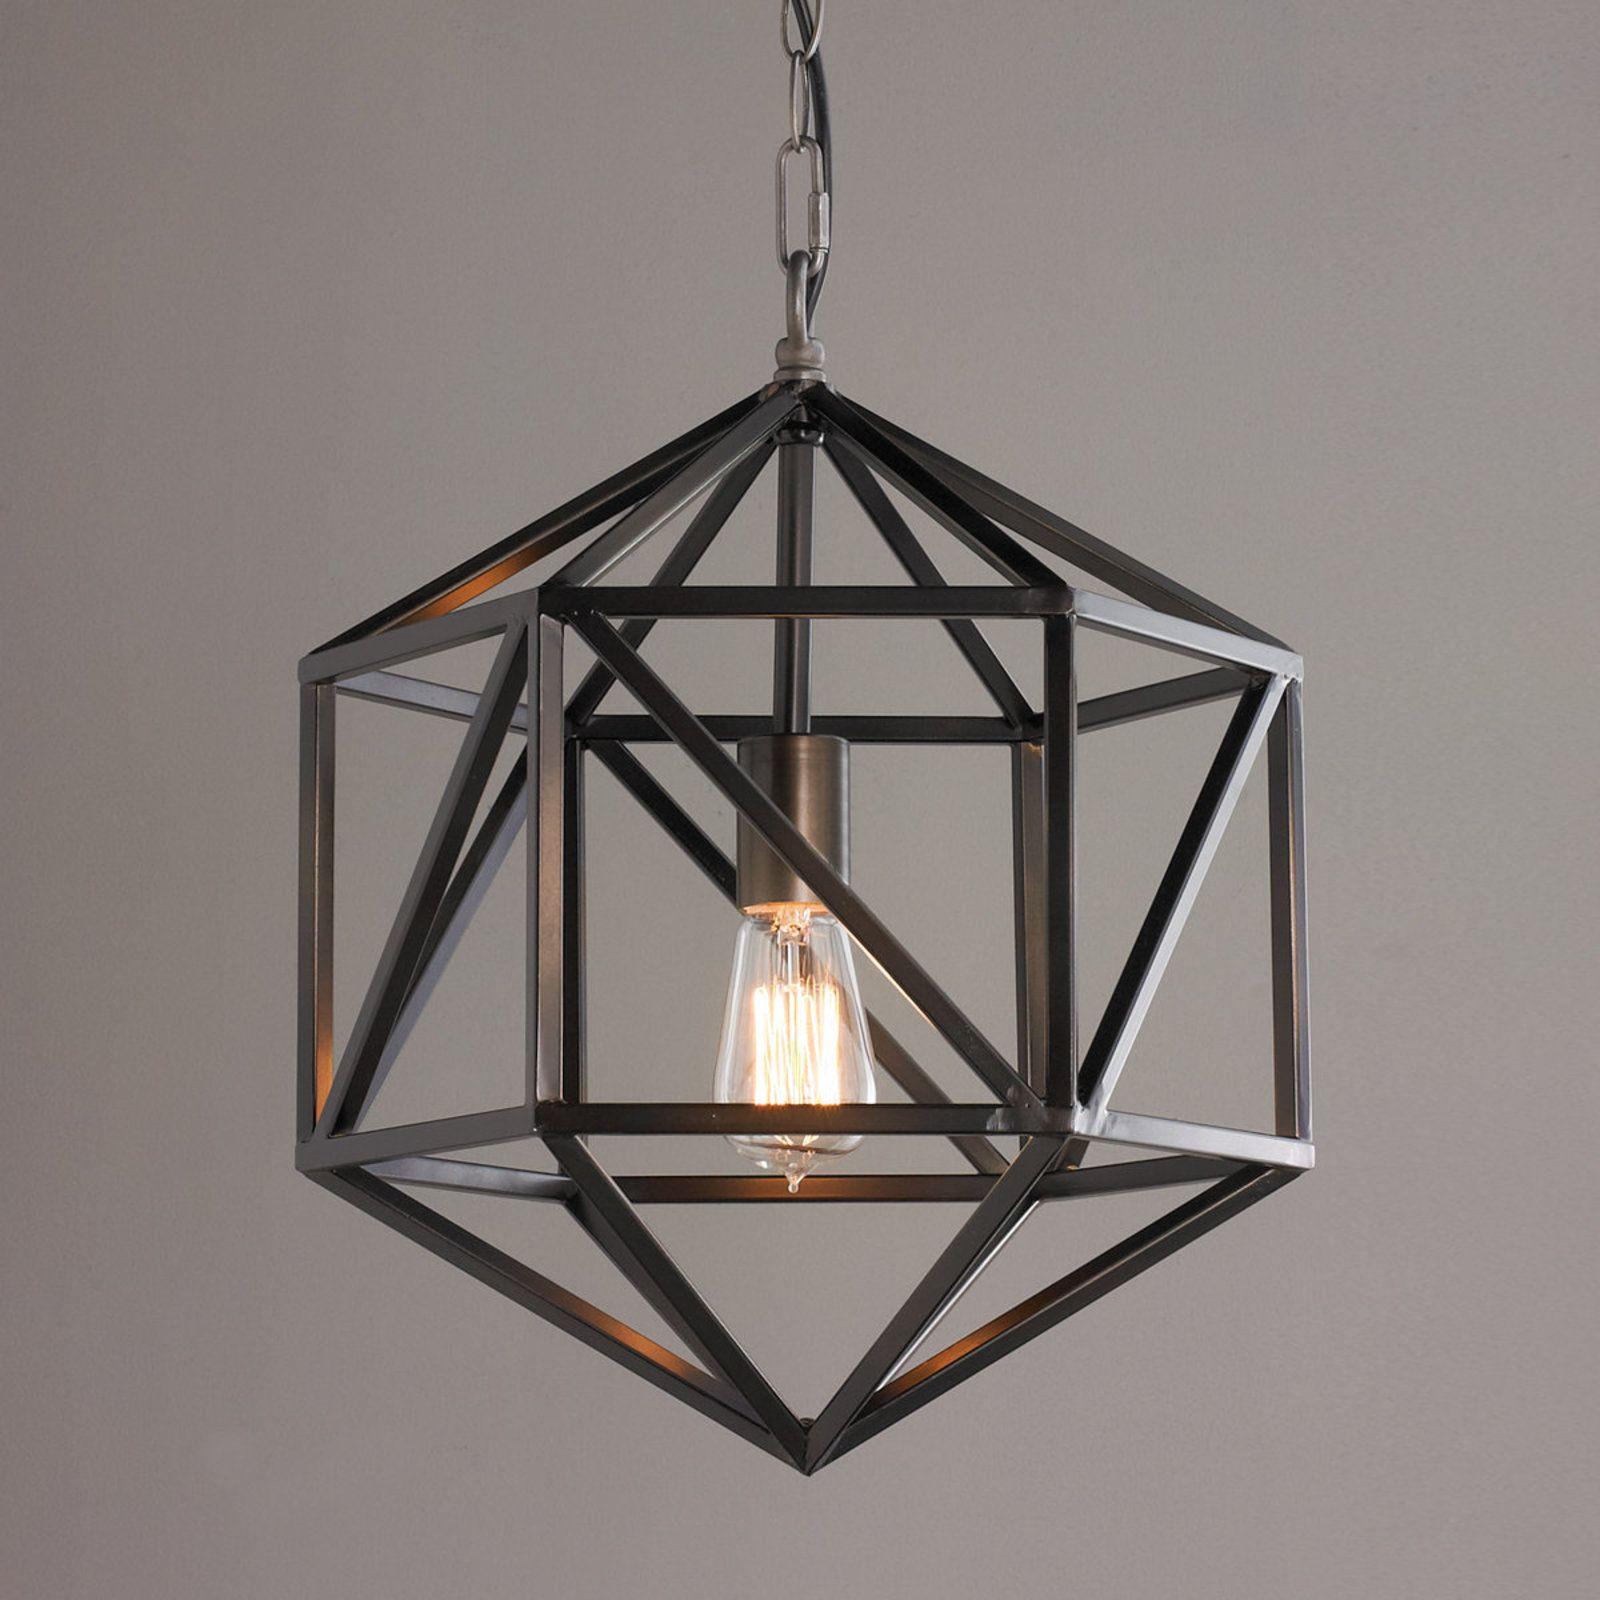 Prism Cage Pendant Light Bronze Cage Pendant Light Geometric Light Fixture Geometric Pendant Light